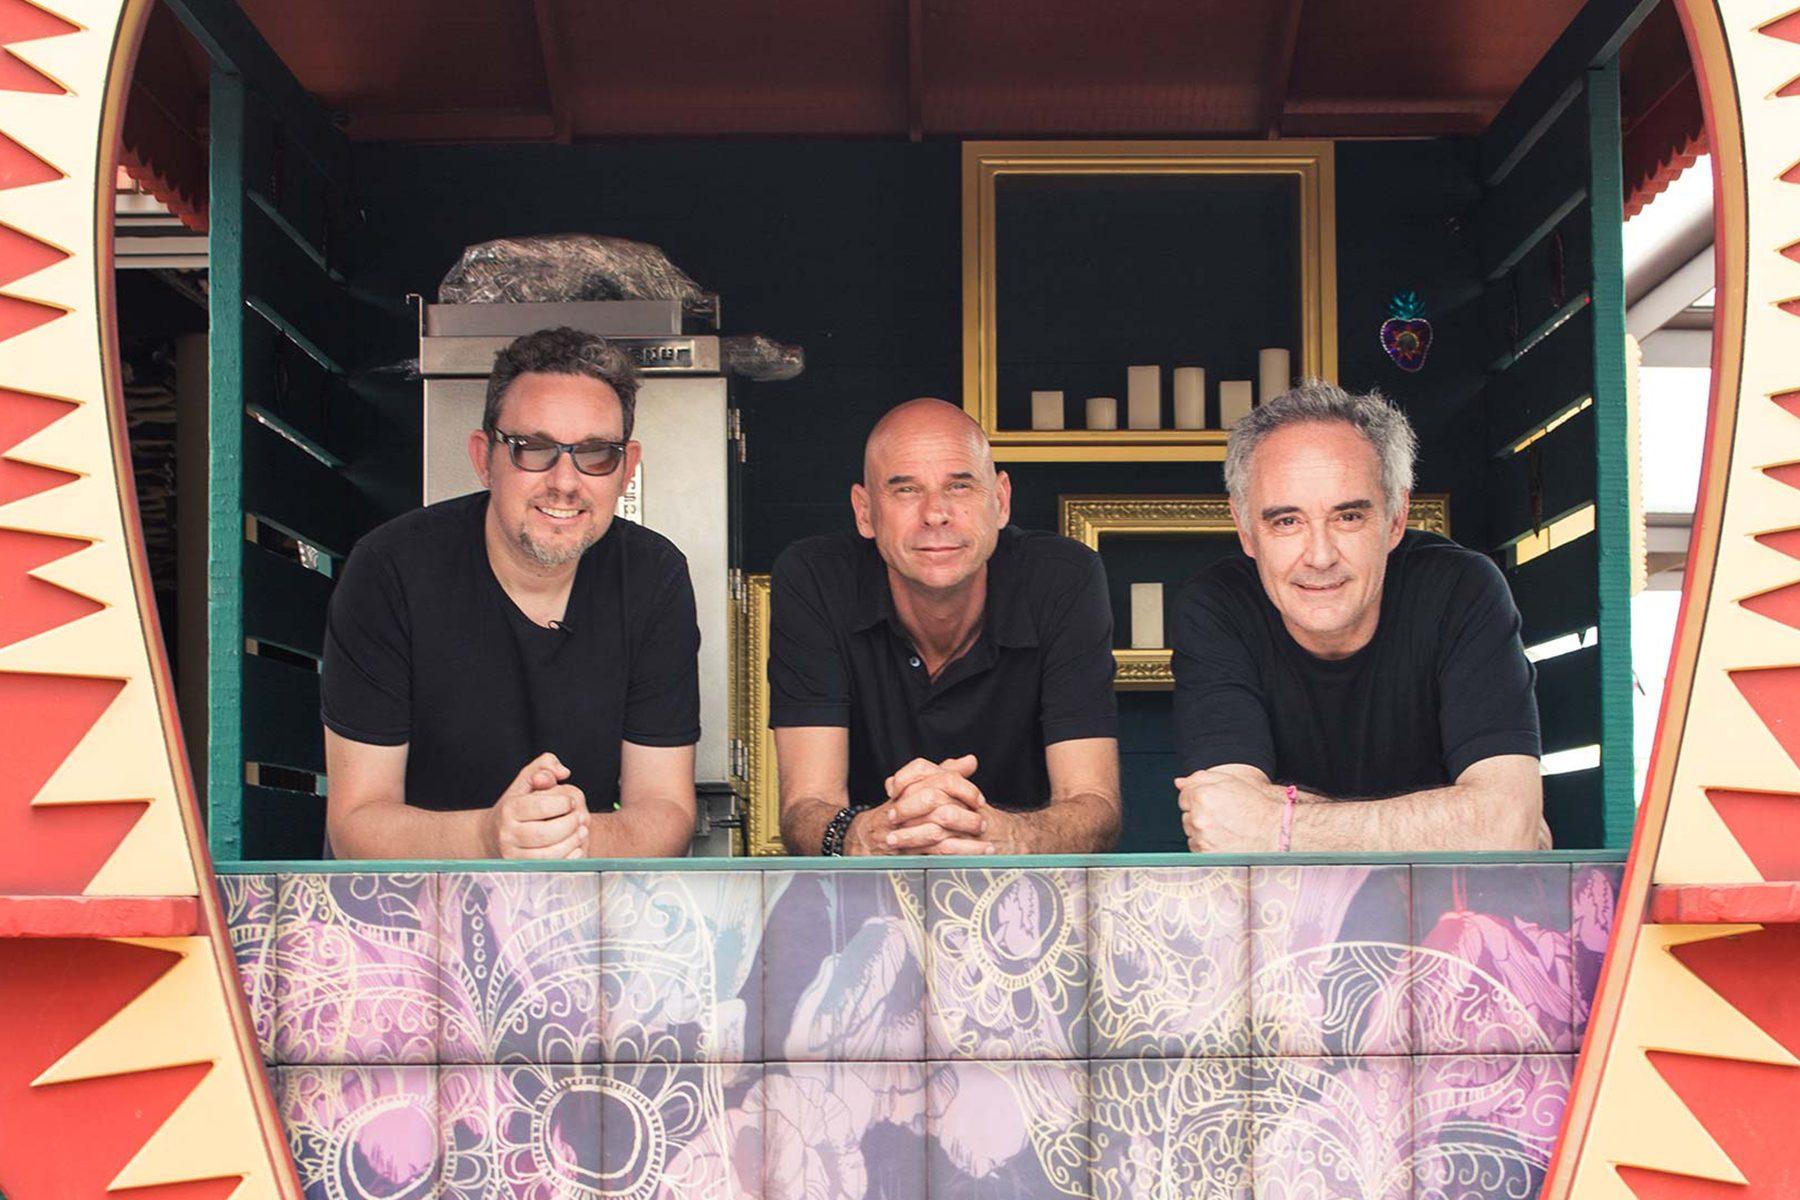 Albert Adrià, Guy Laliberté y Ferran Adrià. Propietarios de Heart Ibiza